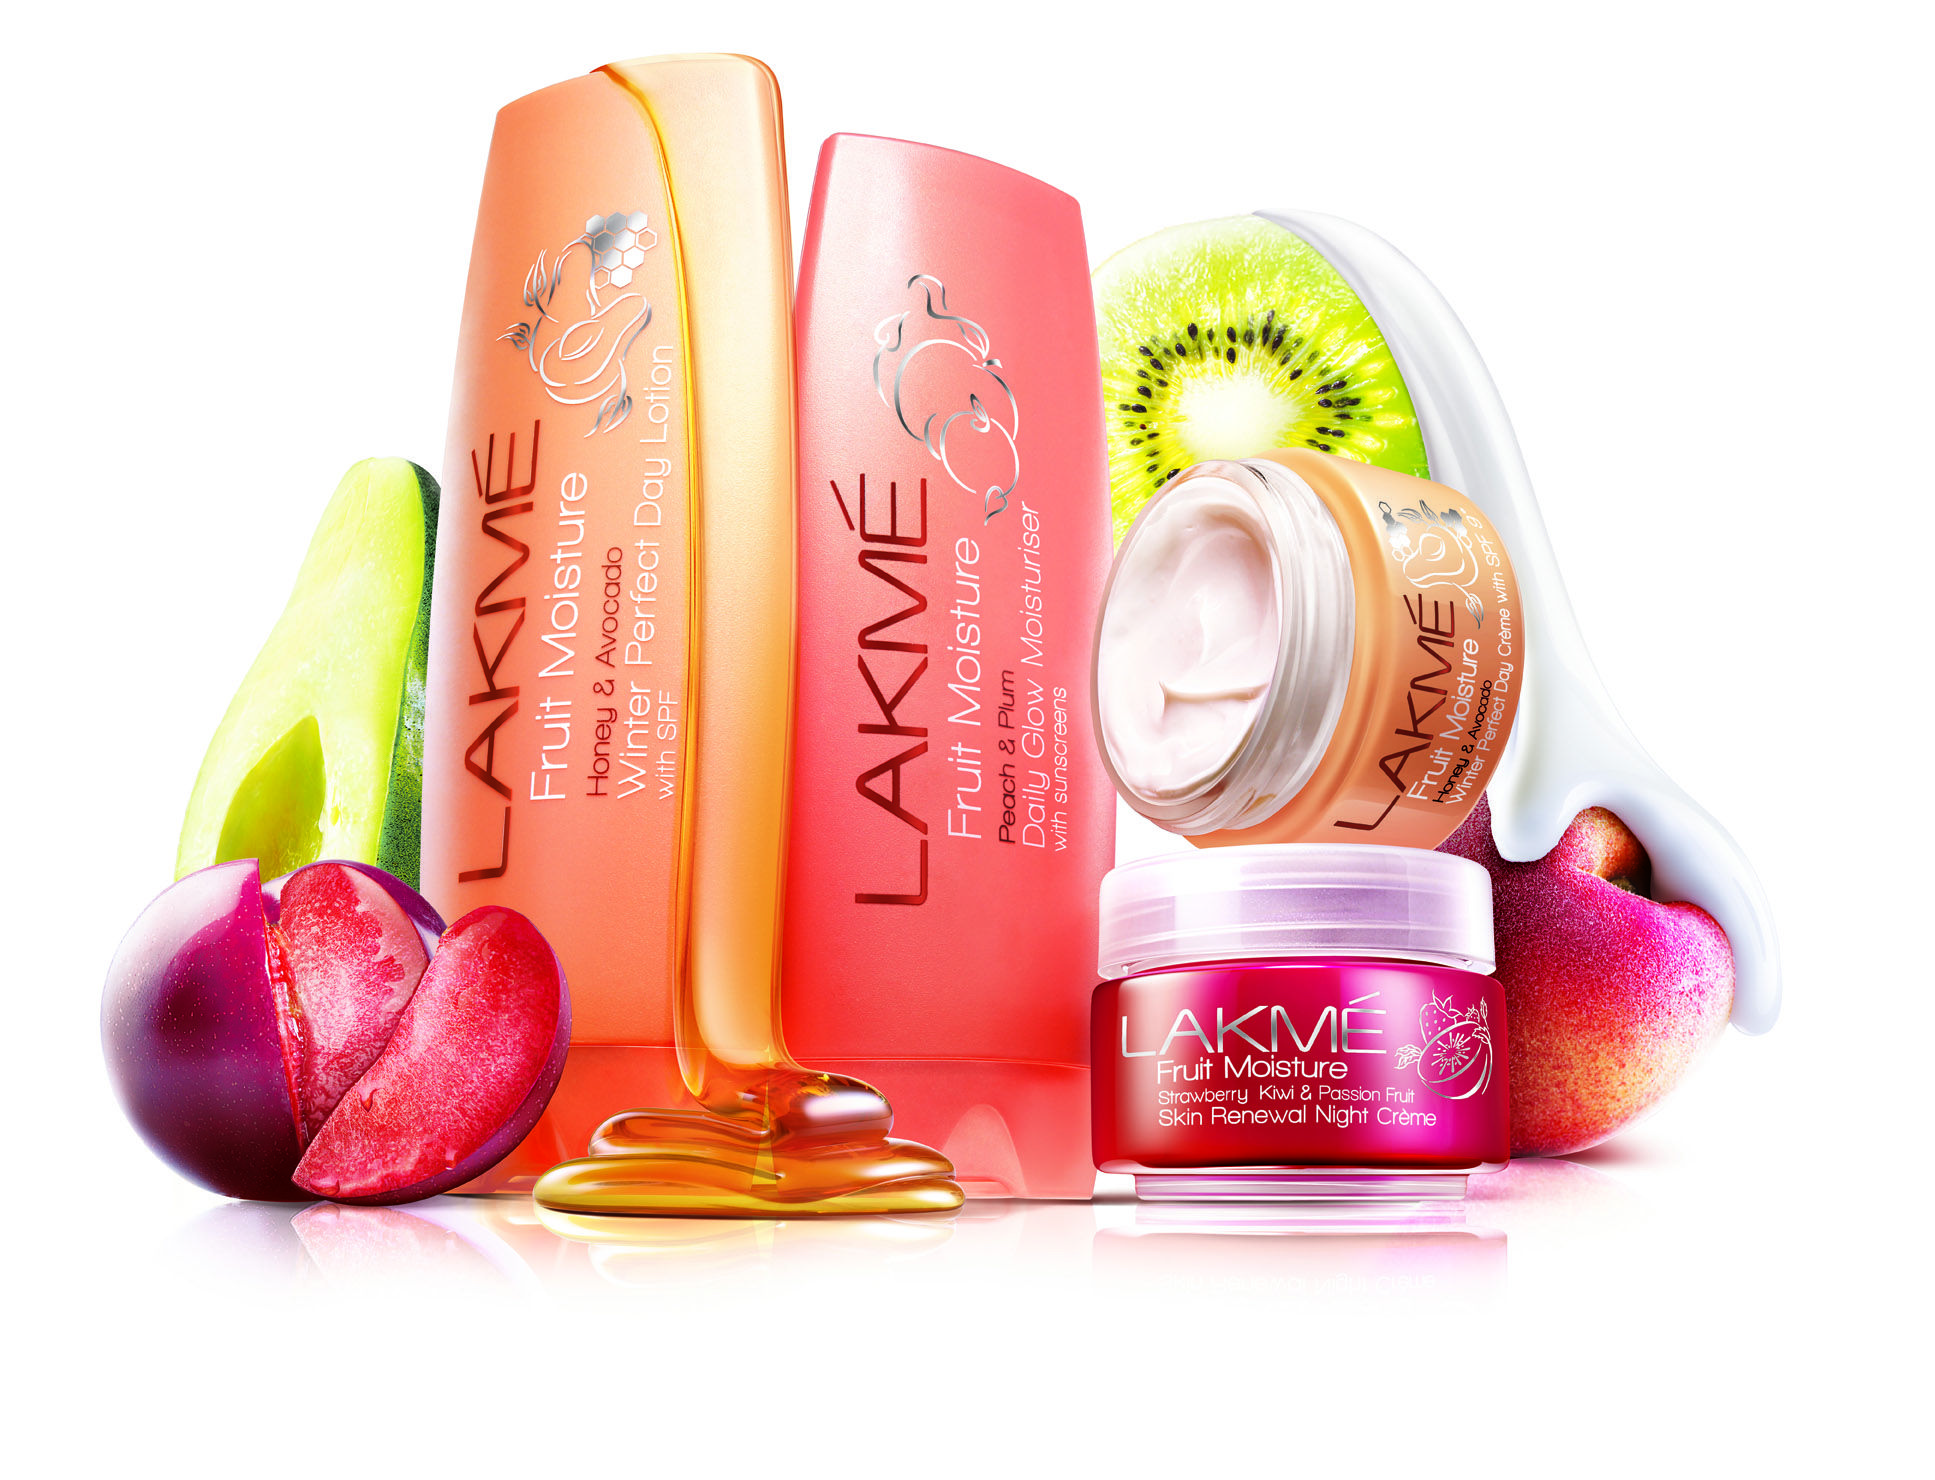 Lakme Cosmetics USA Cosmetics, Perfume, Makeup Lakme